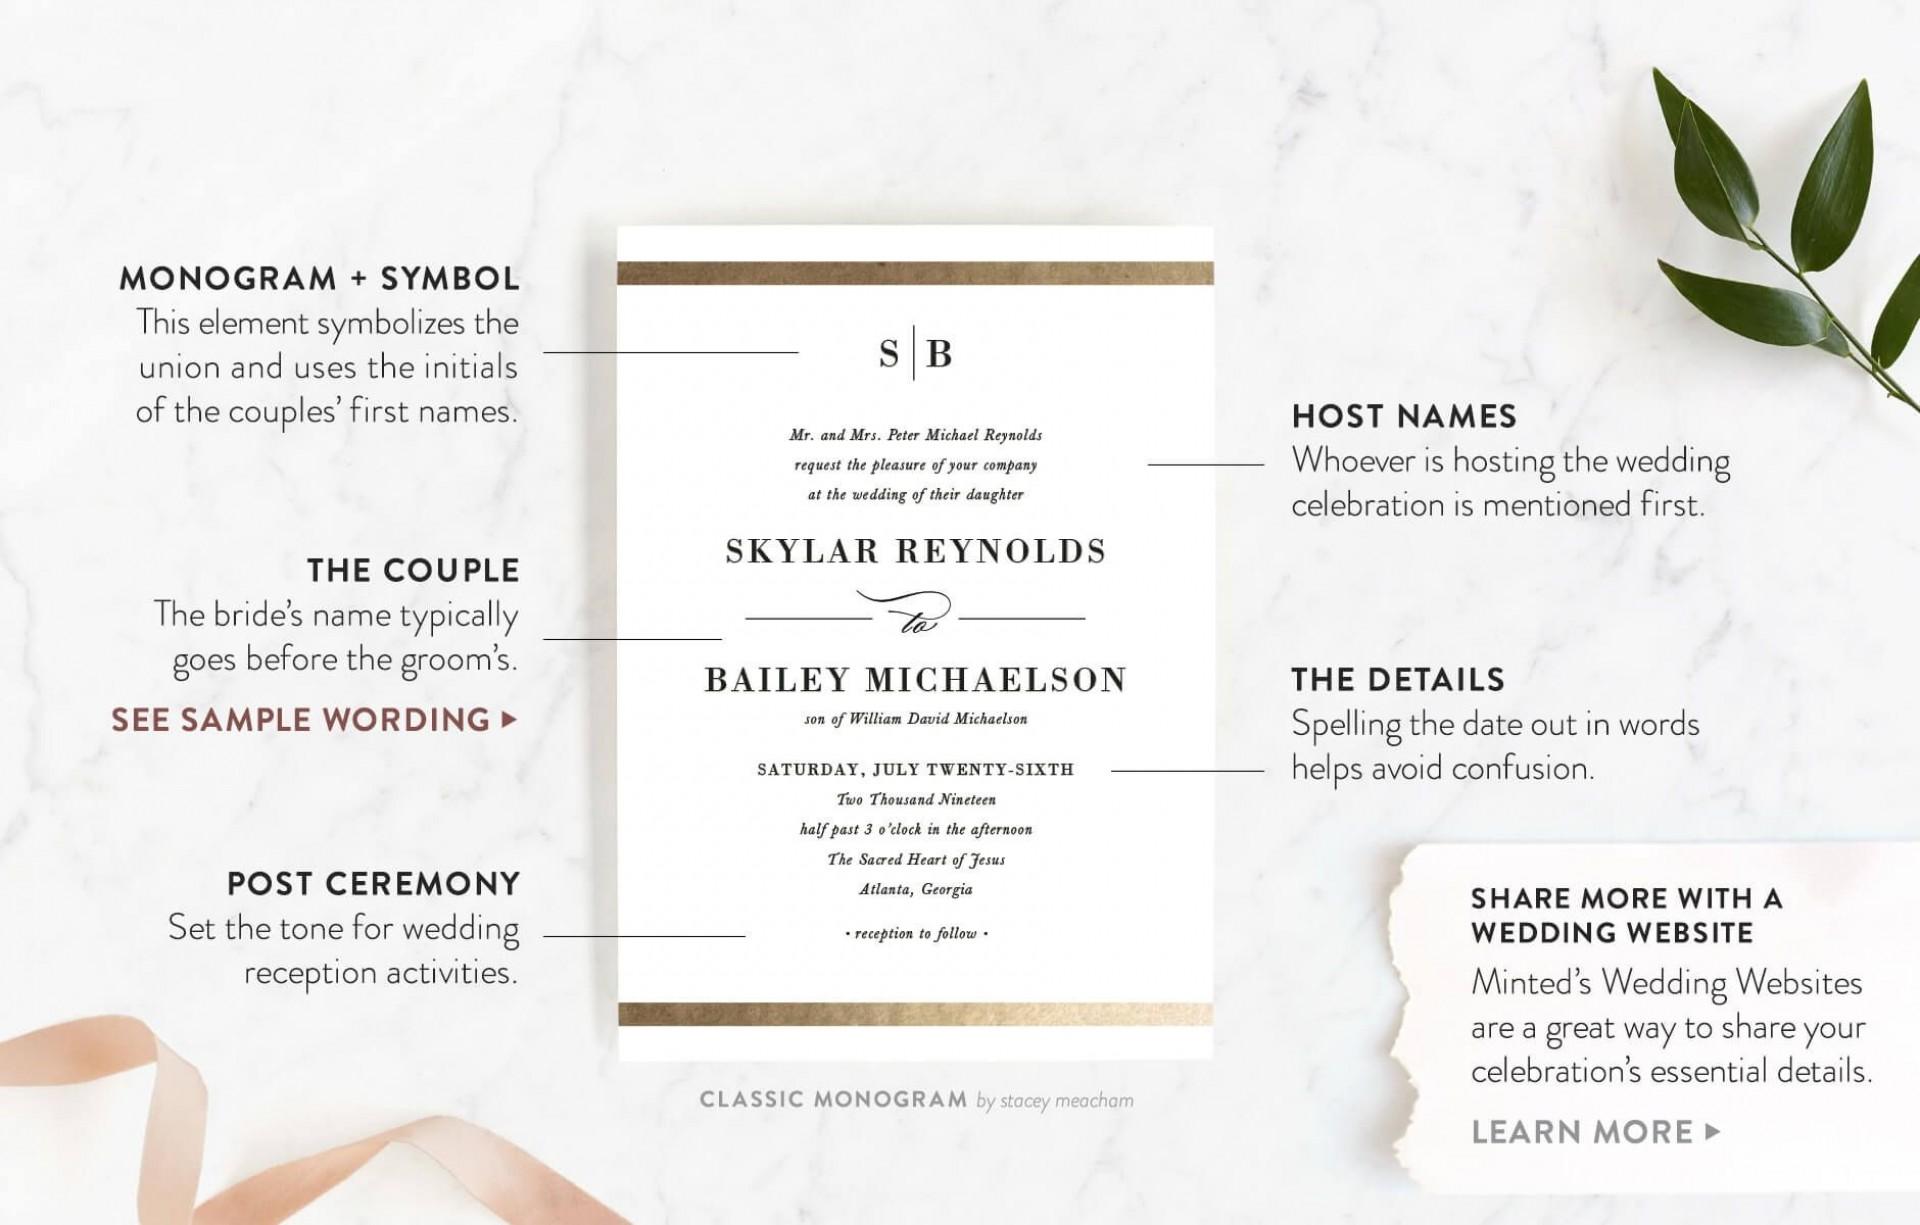 002 Fantastic Formal Wedding Invitation Wording Template Design  Templates1920